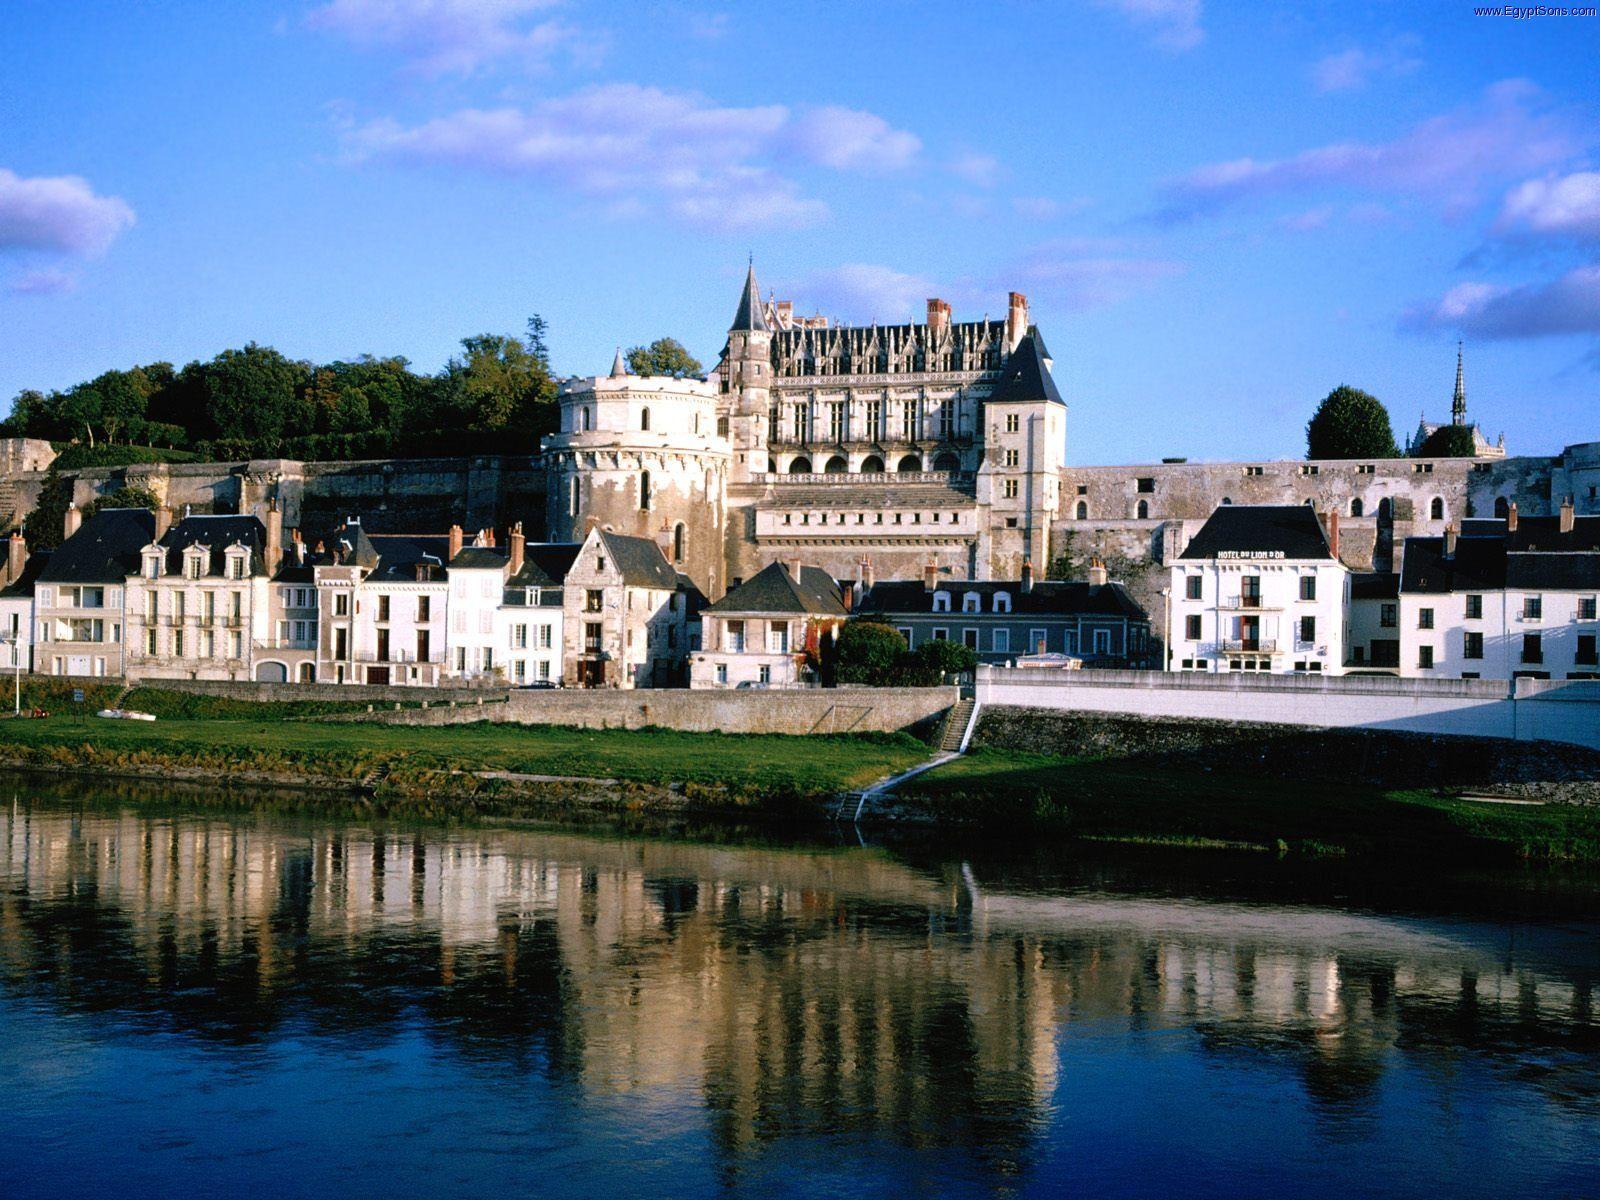 France S Top 10 Châteaux In Loire Valley Castillos Del Loira Castillos Viajes A Francia